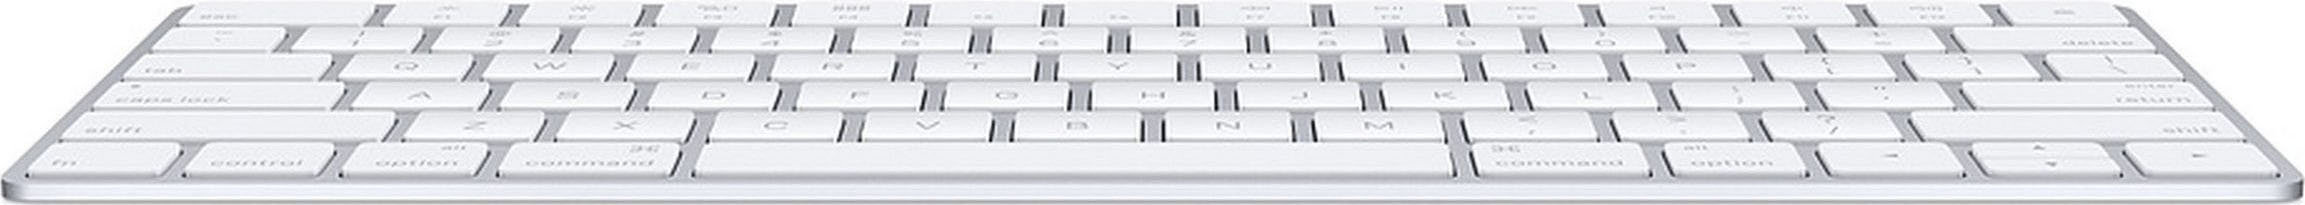 Apple Apple-Tastatur Magic Keyboard , Multimedia-Tasten